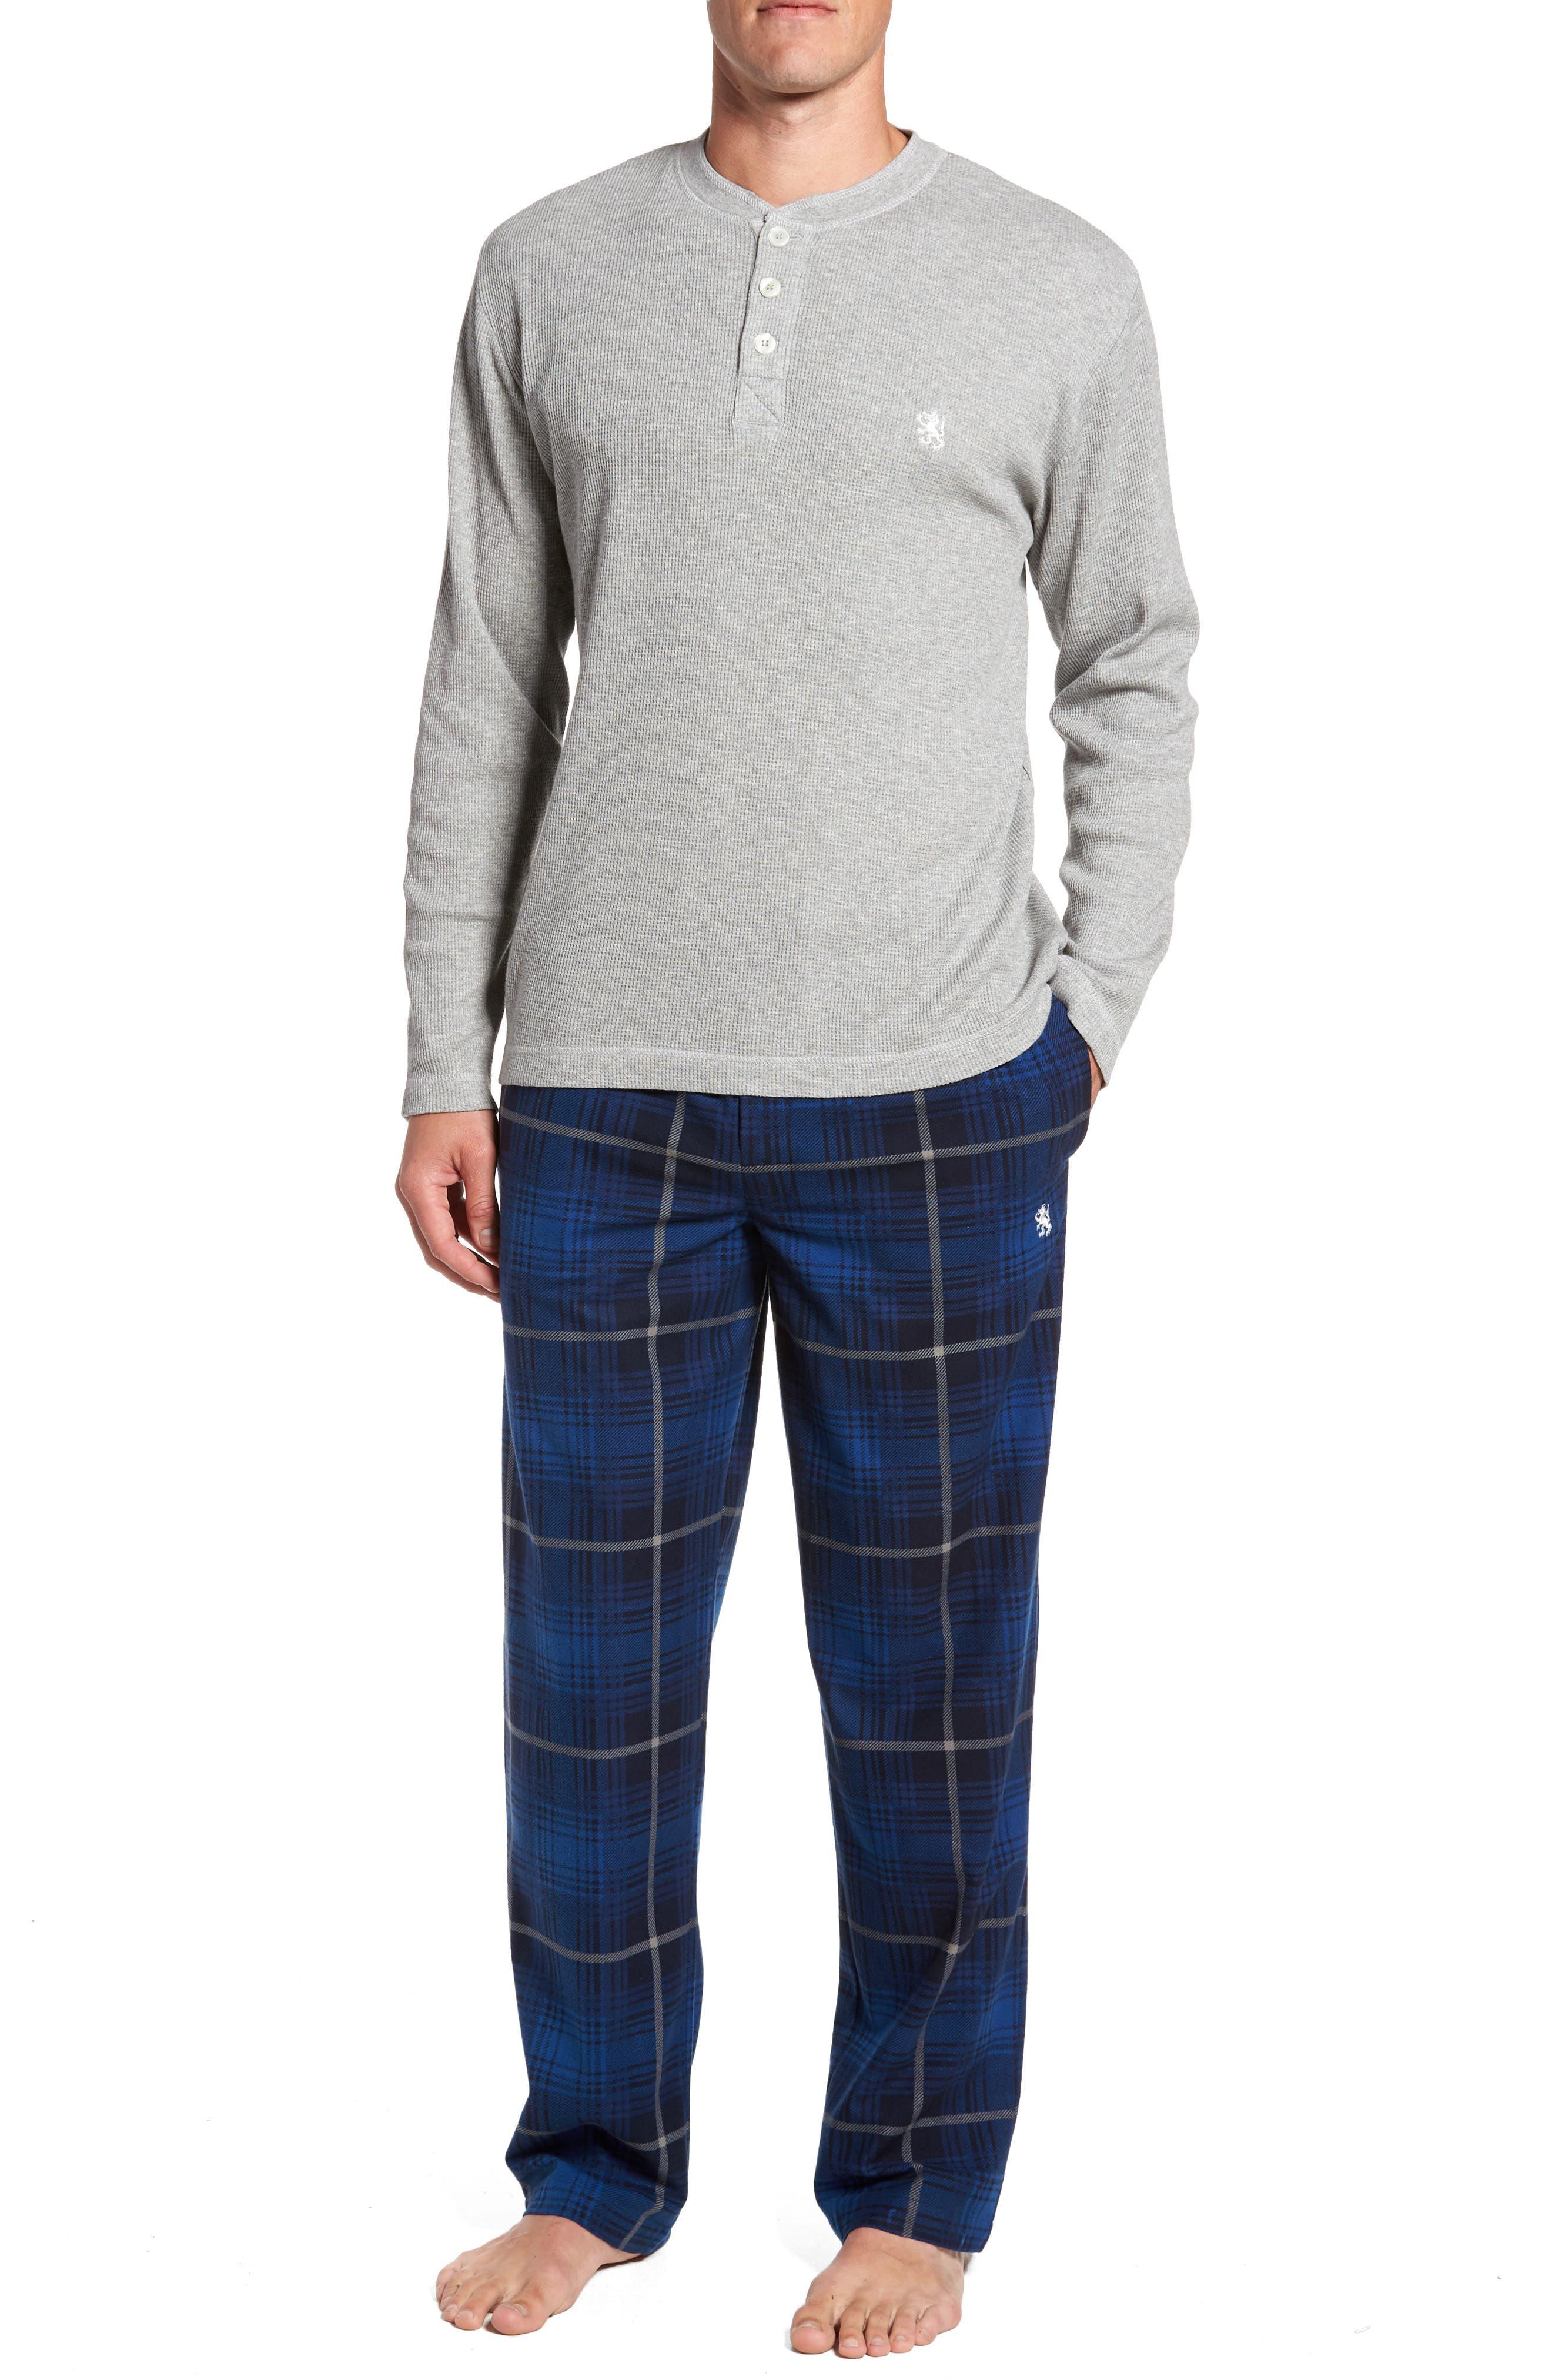 Nifty Gift Henley Shirt & Lounge Pants,                             Main thumbnail 1, color,                             025